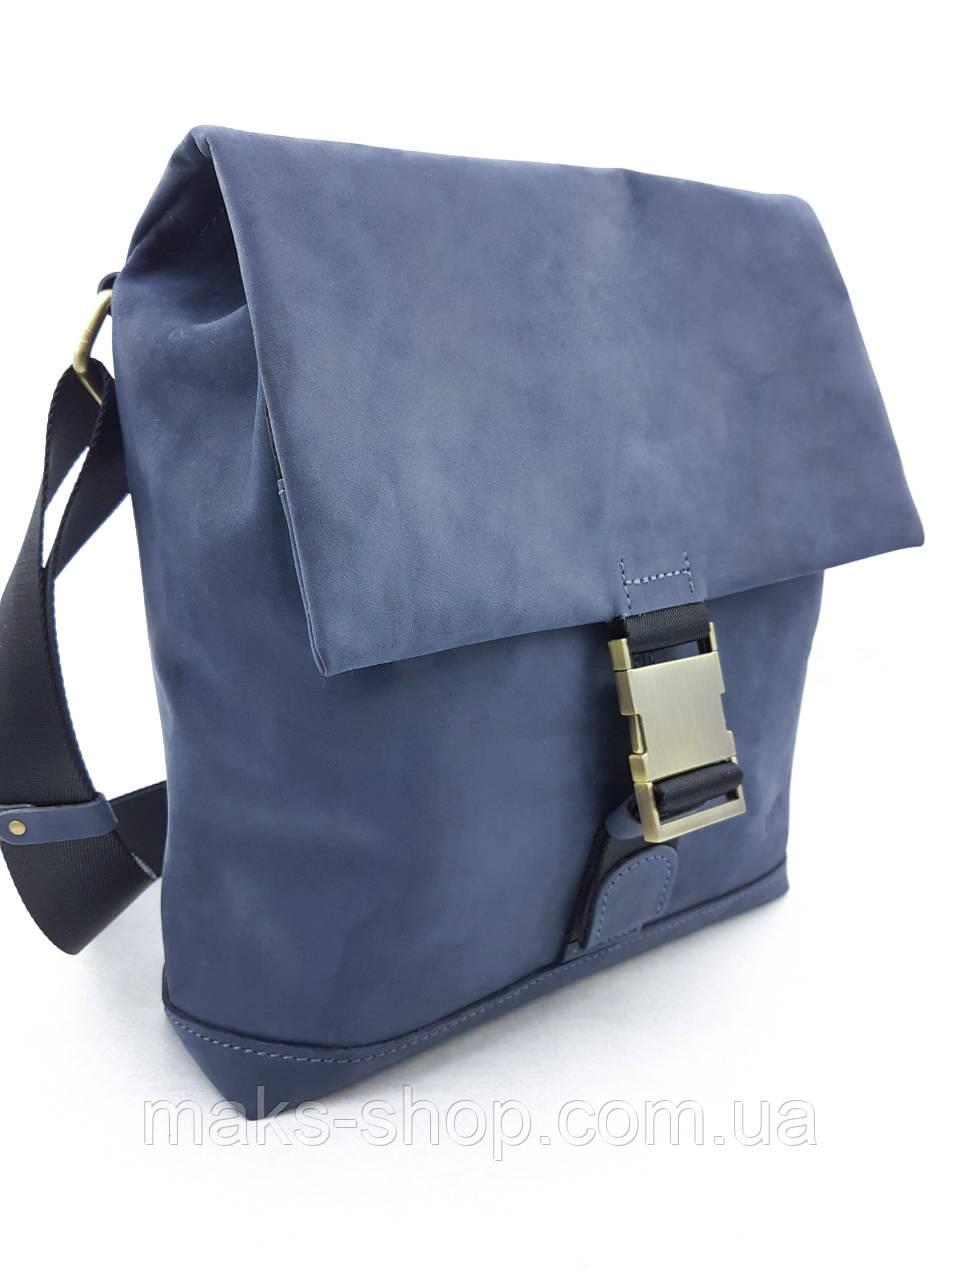 0a43ccd8110f Удобная кожаная мужская сумка VATTO Mk73 Kr600 - Maks Shop- надежный и  перспективный интернет магазин